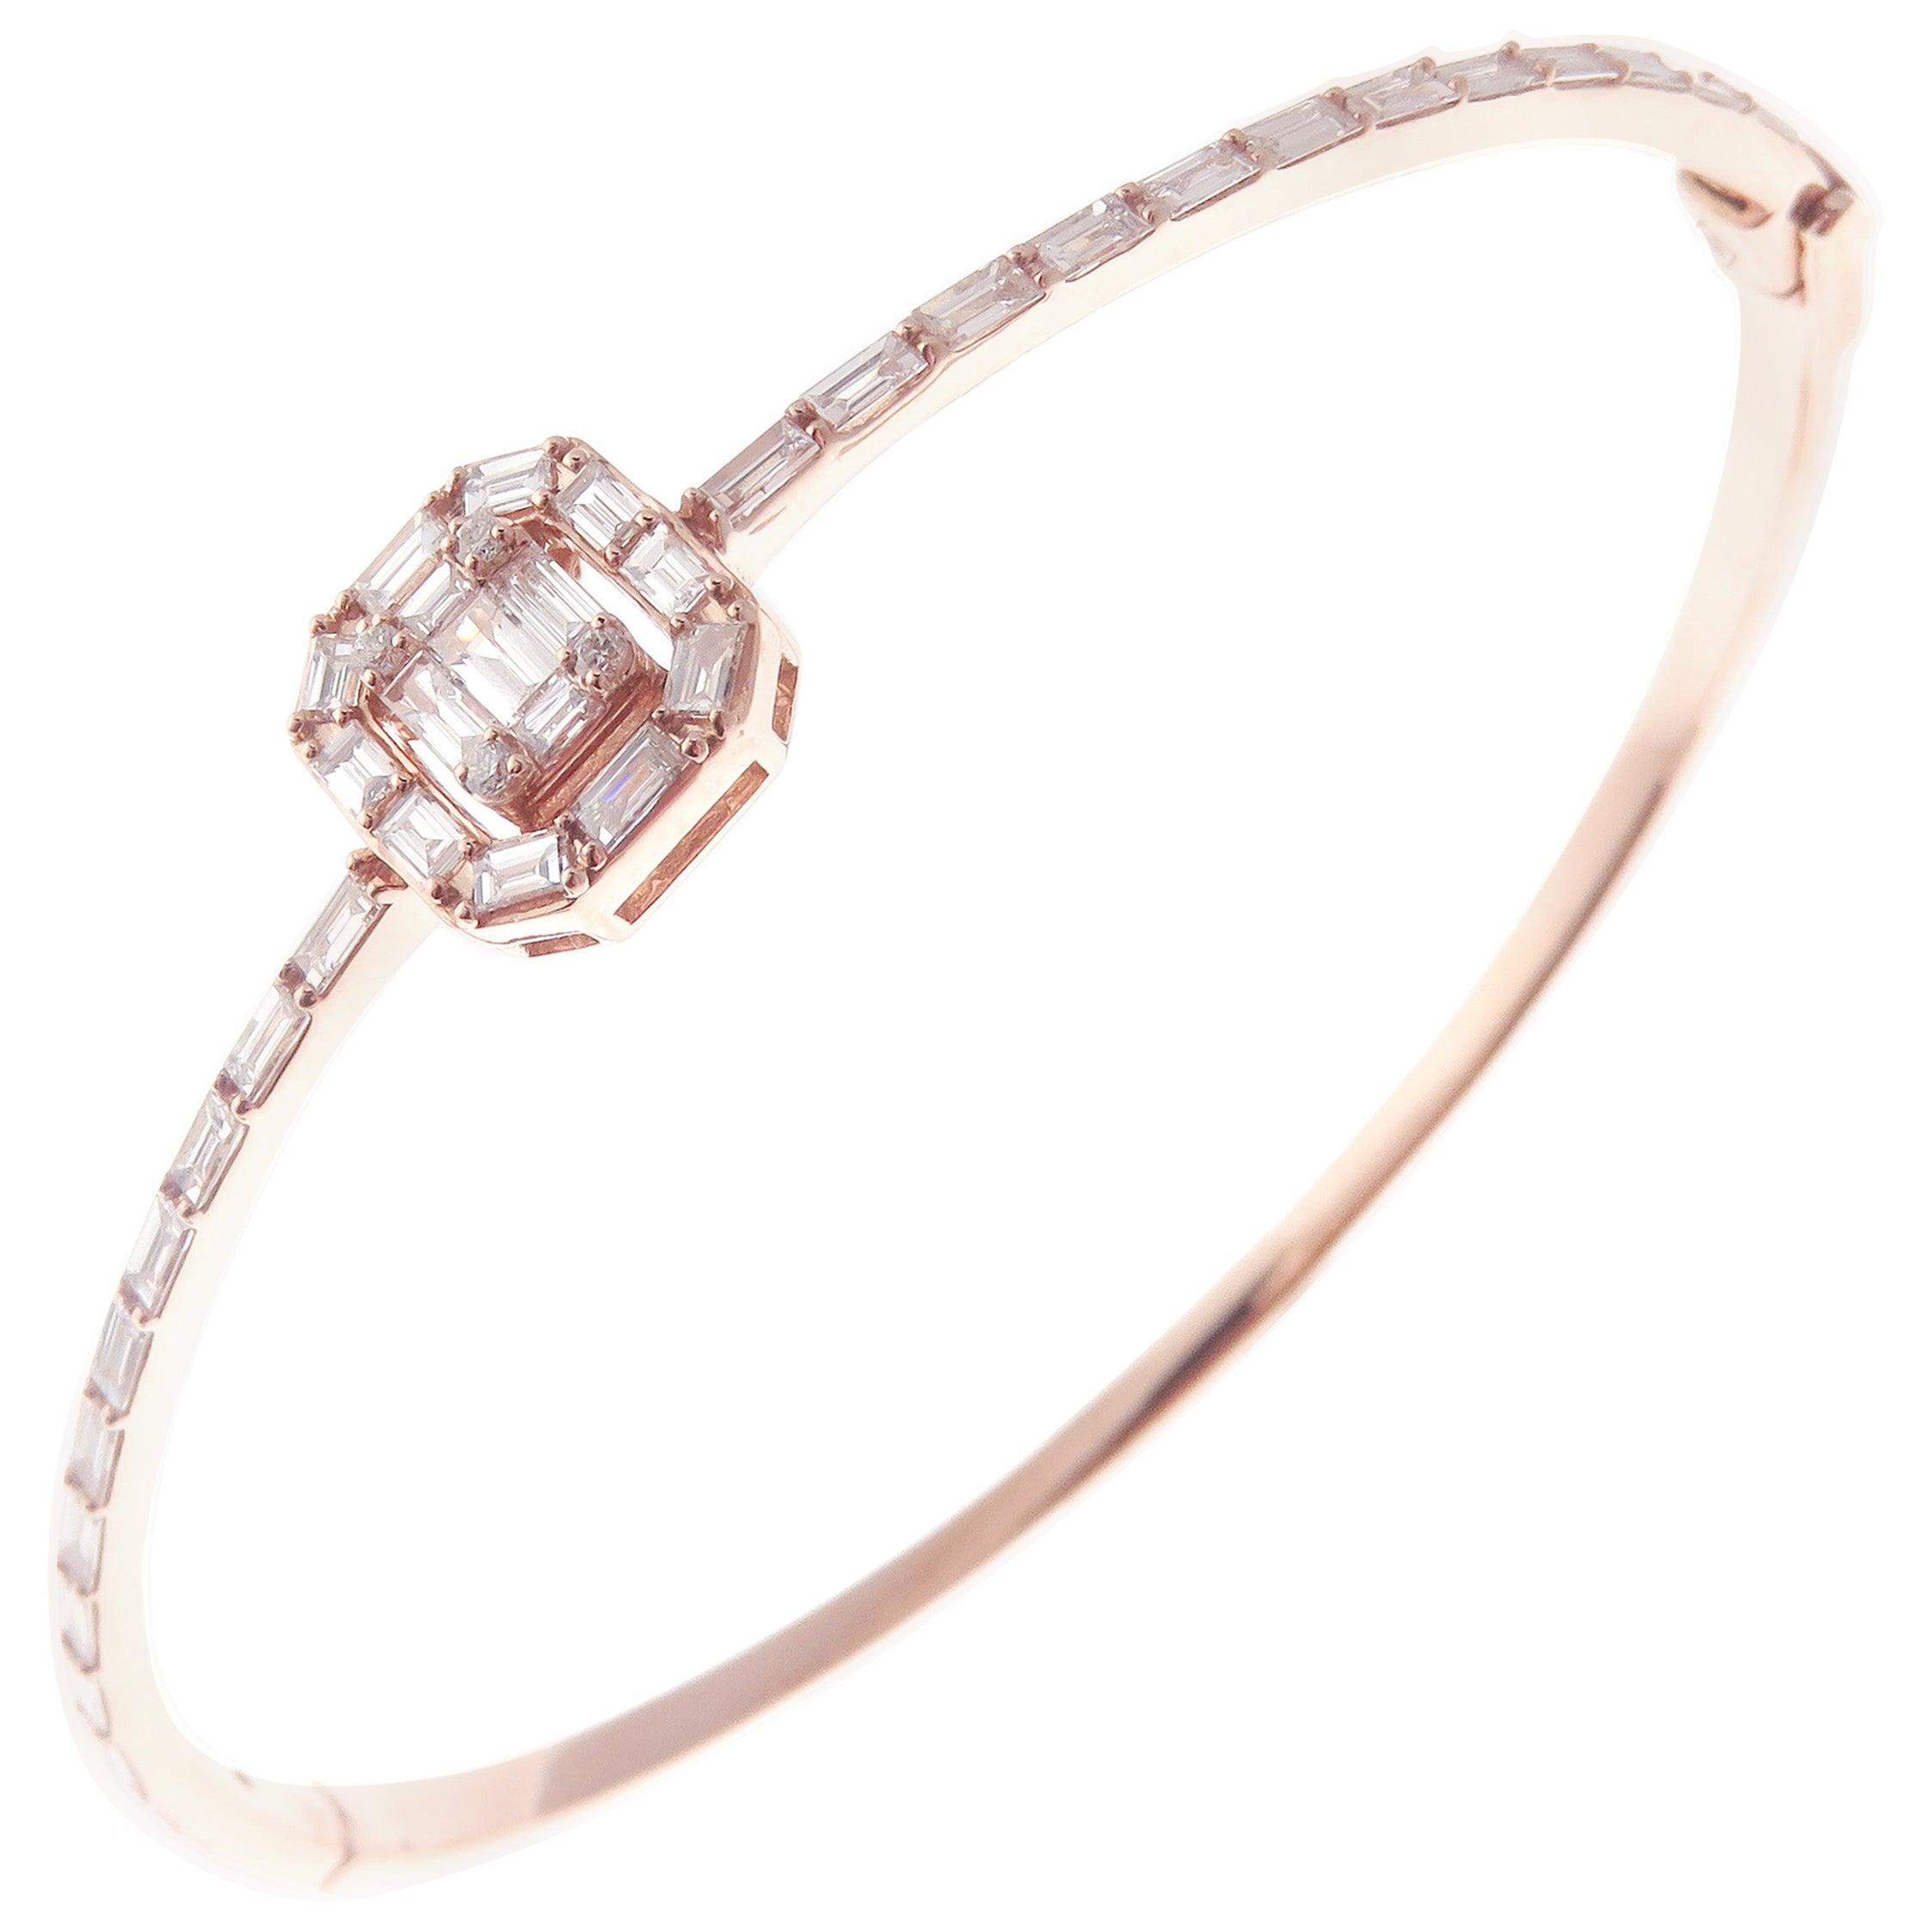 18 Karat Rose Gold Diamond Delicate Square Baguette Bangle Bracelet